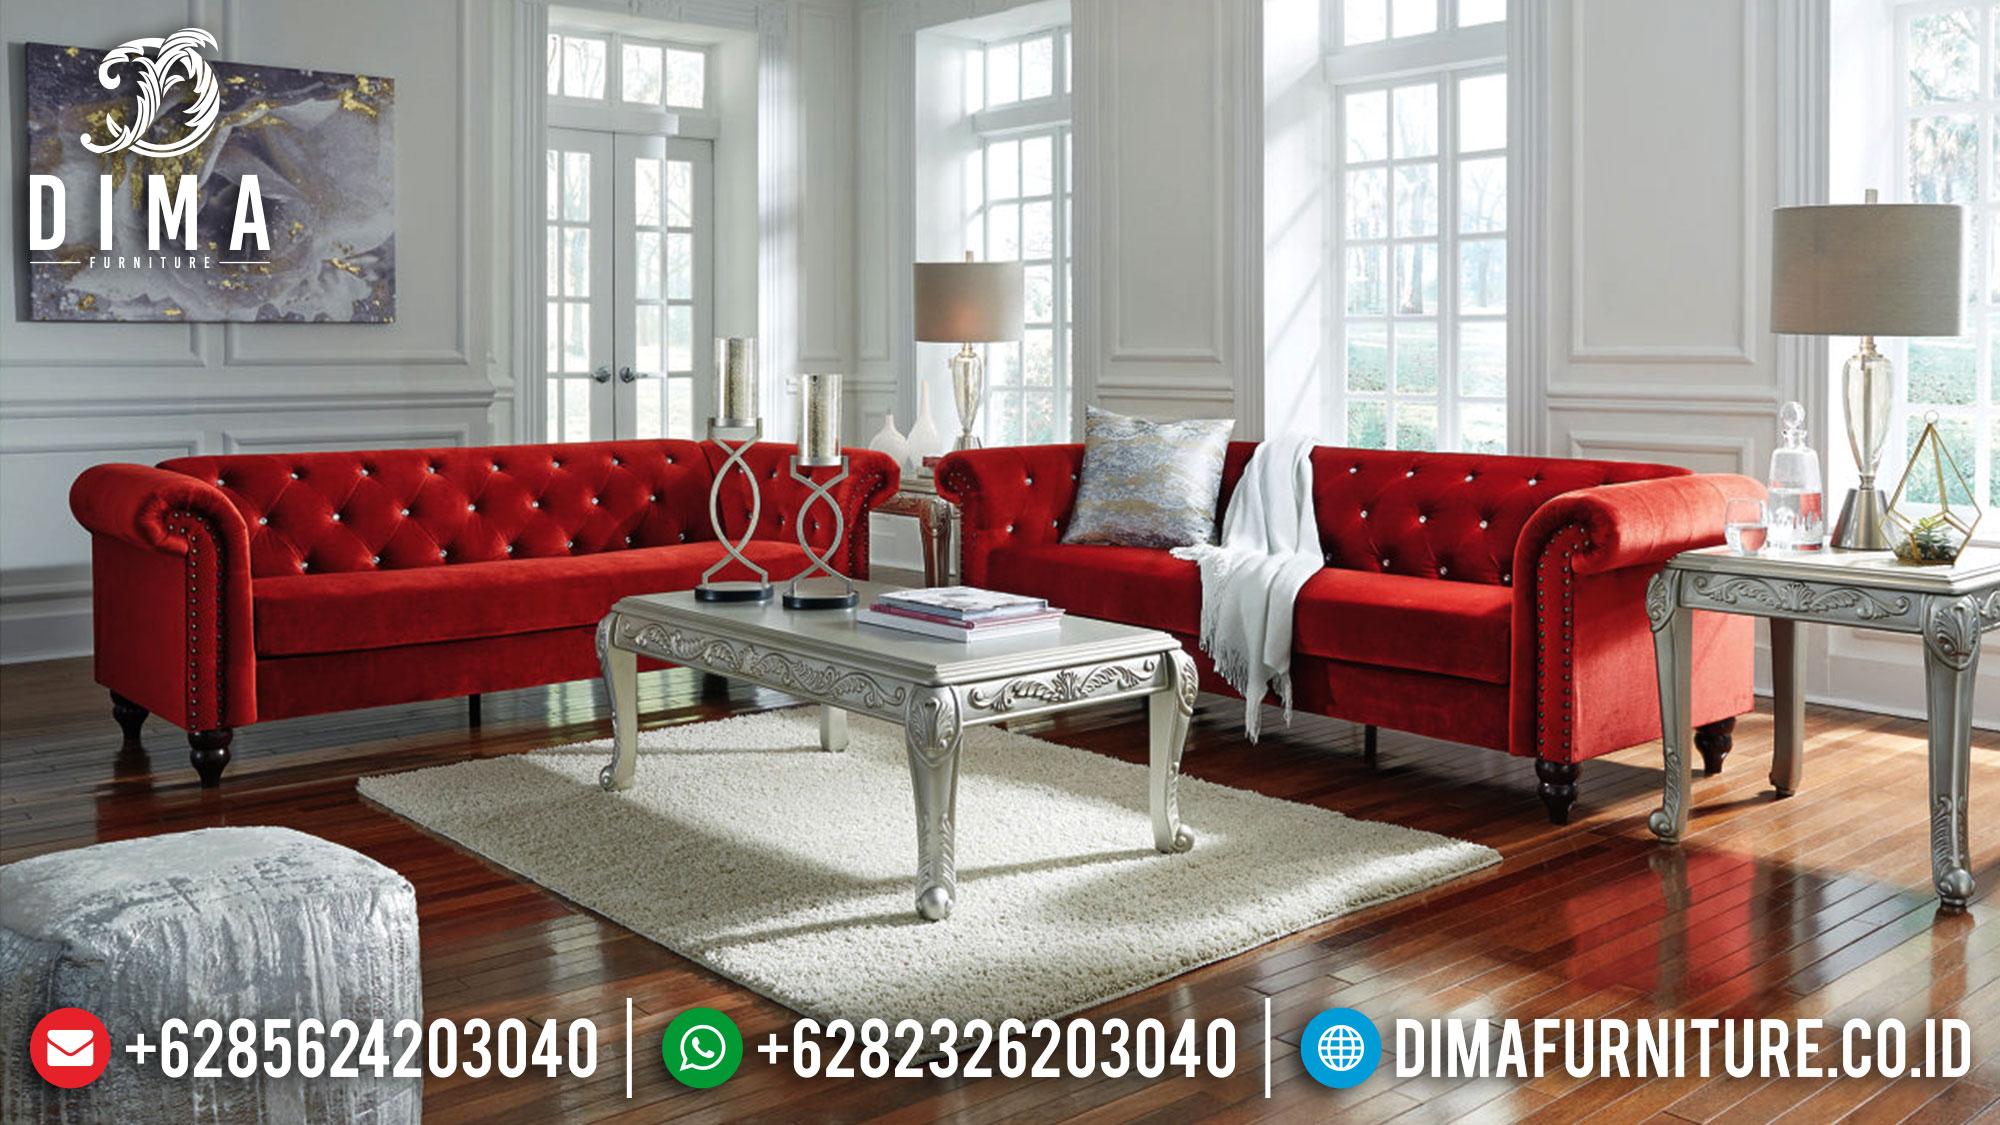 Flash Sale Sofa Tamu Sudut Chesterfield Minimalis Design Red Soft Fabric Mm-0977